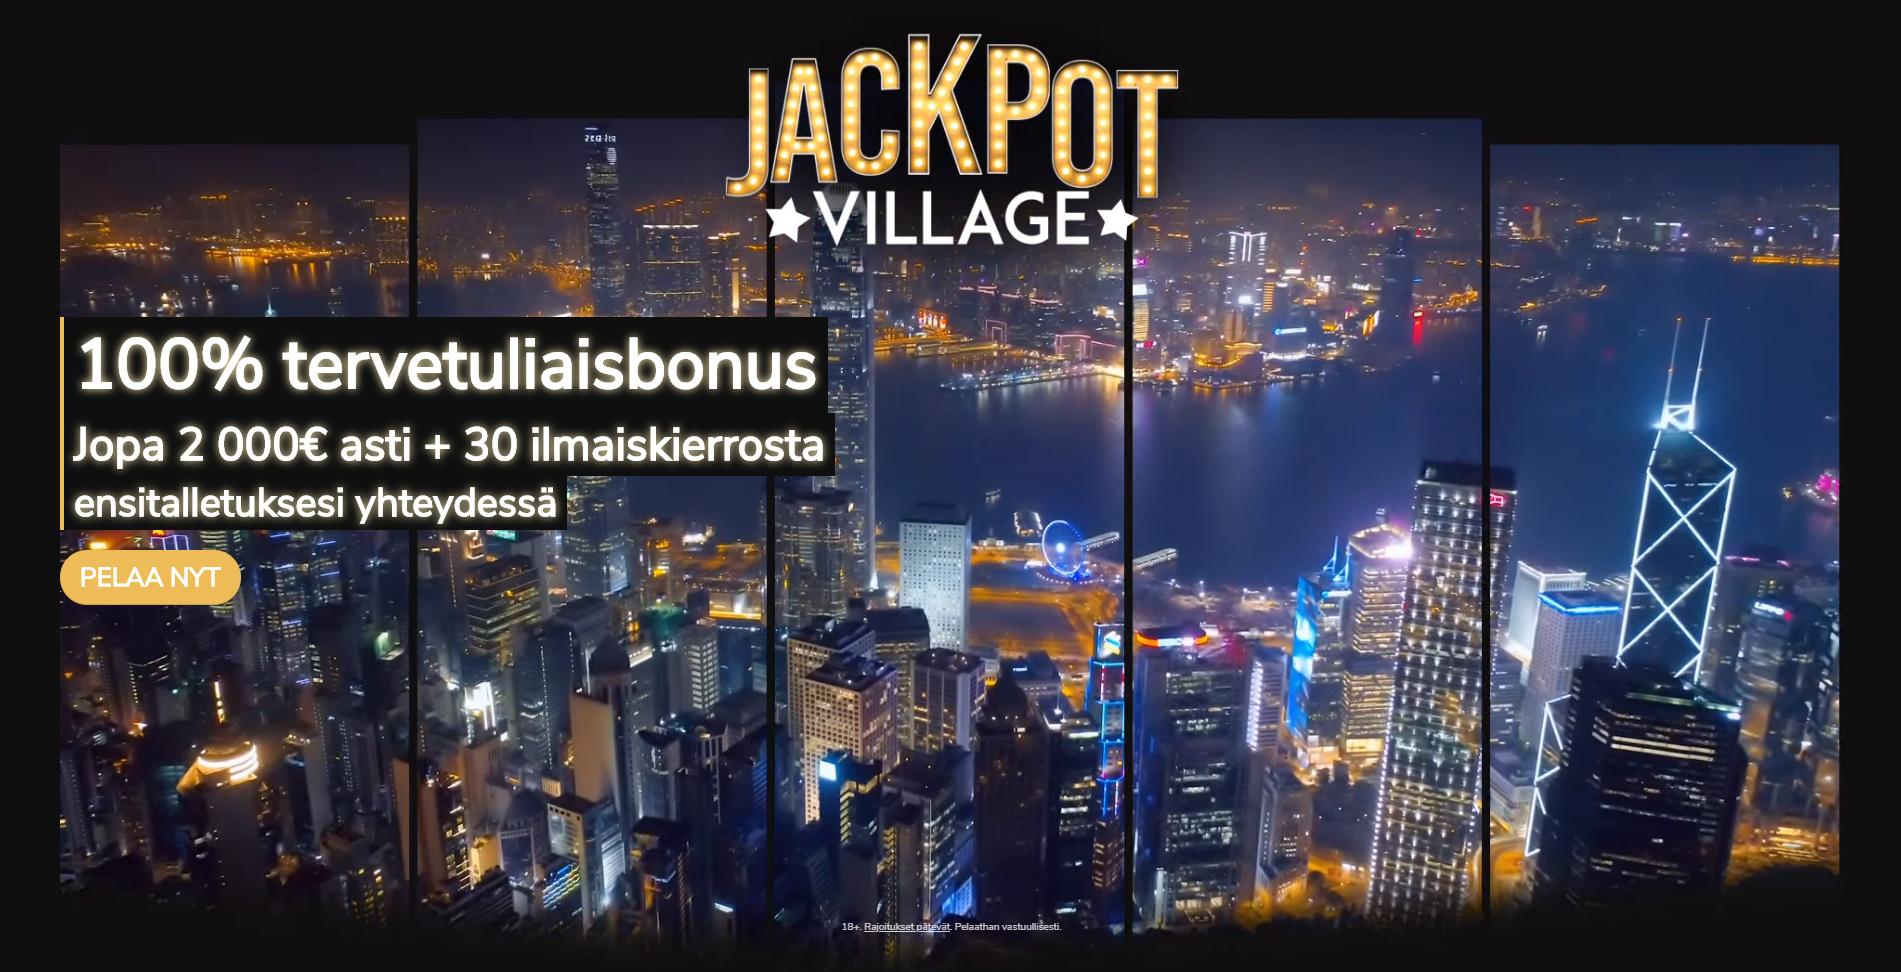 JackpotVillage-Casino-Finland-Images1